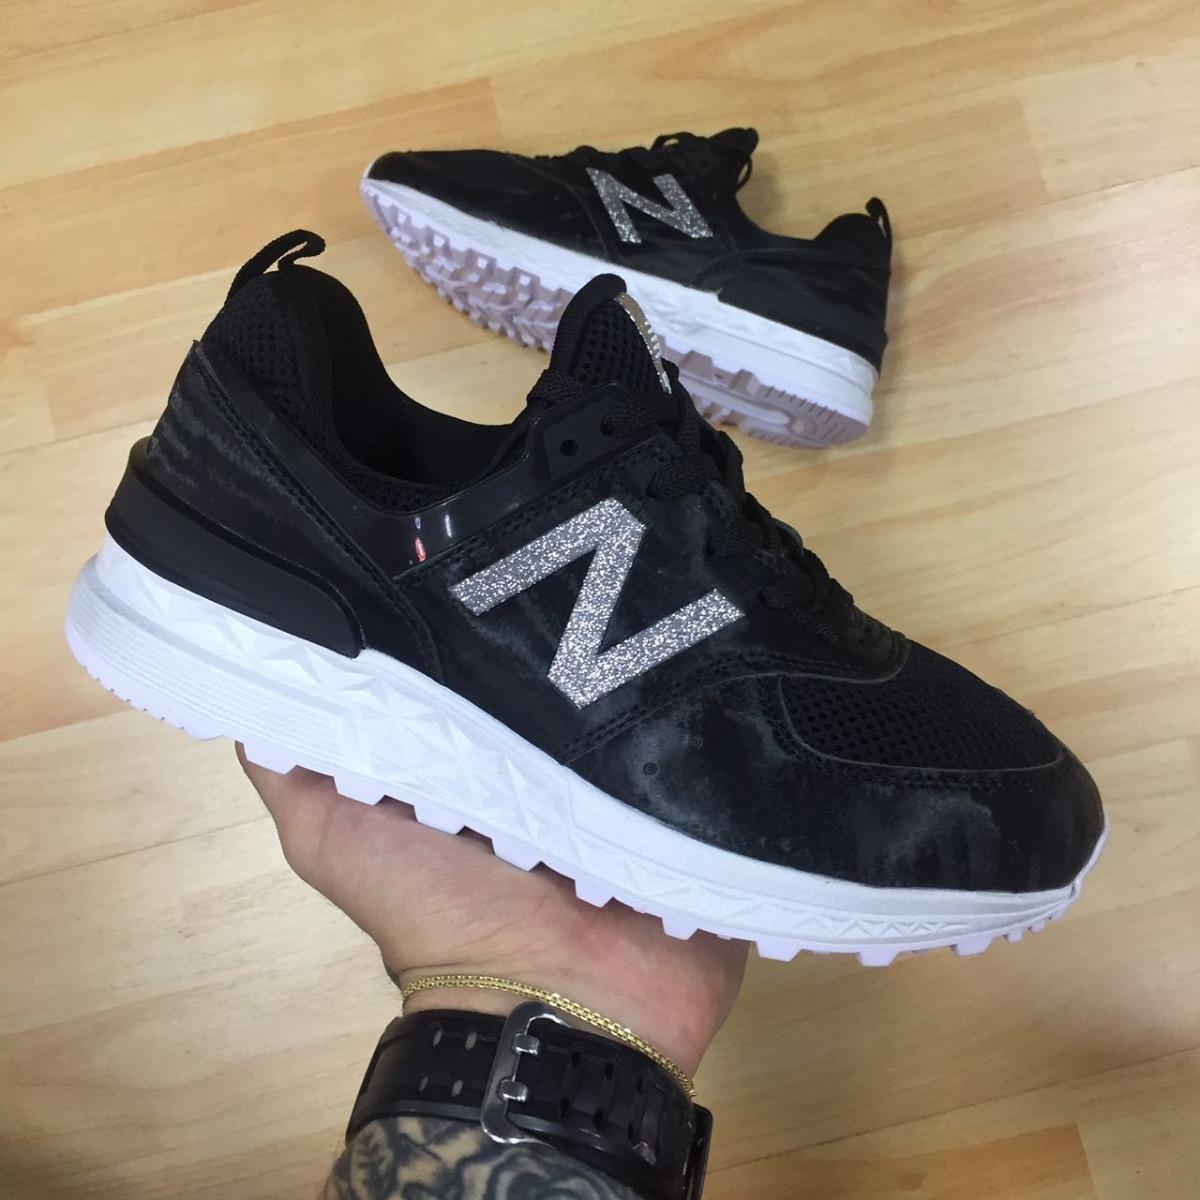 Tenis Zapatillas New Balance 530 Negra Blanca Mujer Env Gr